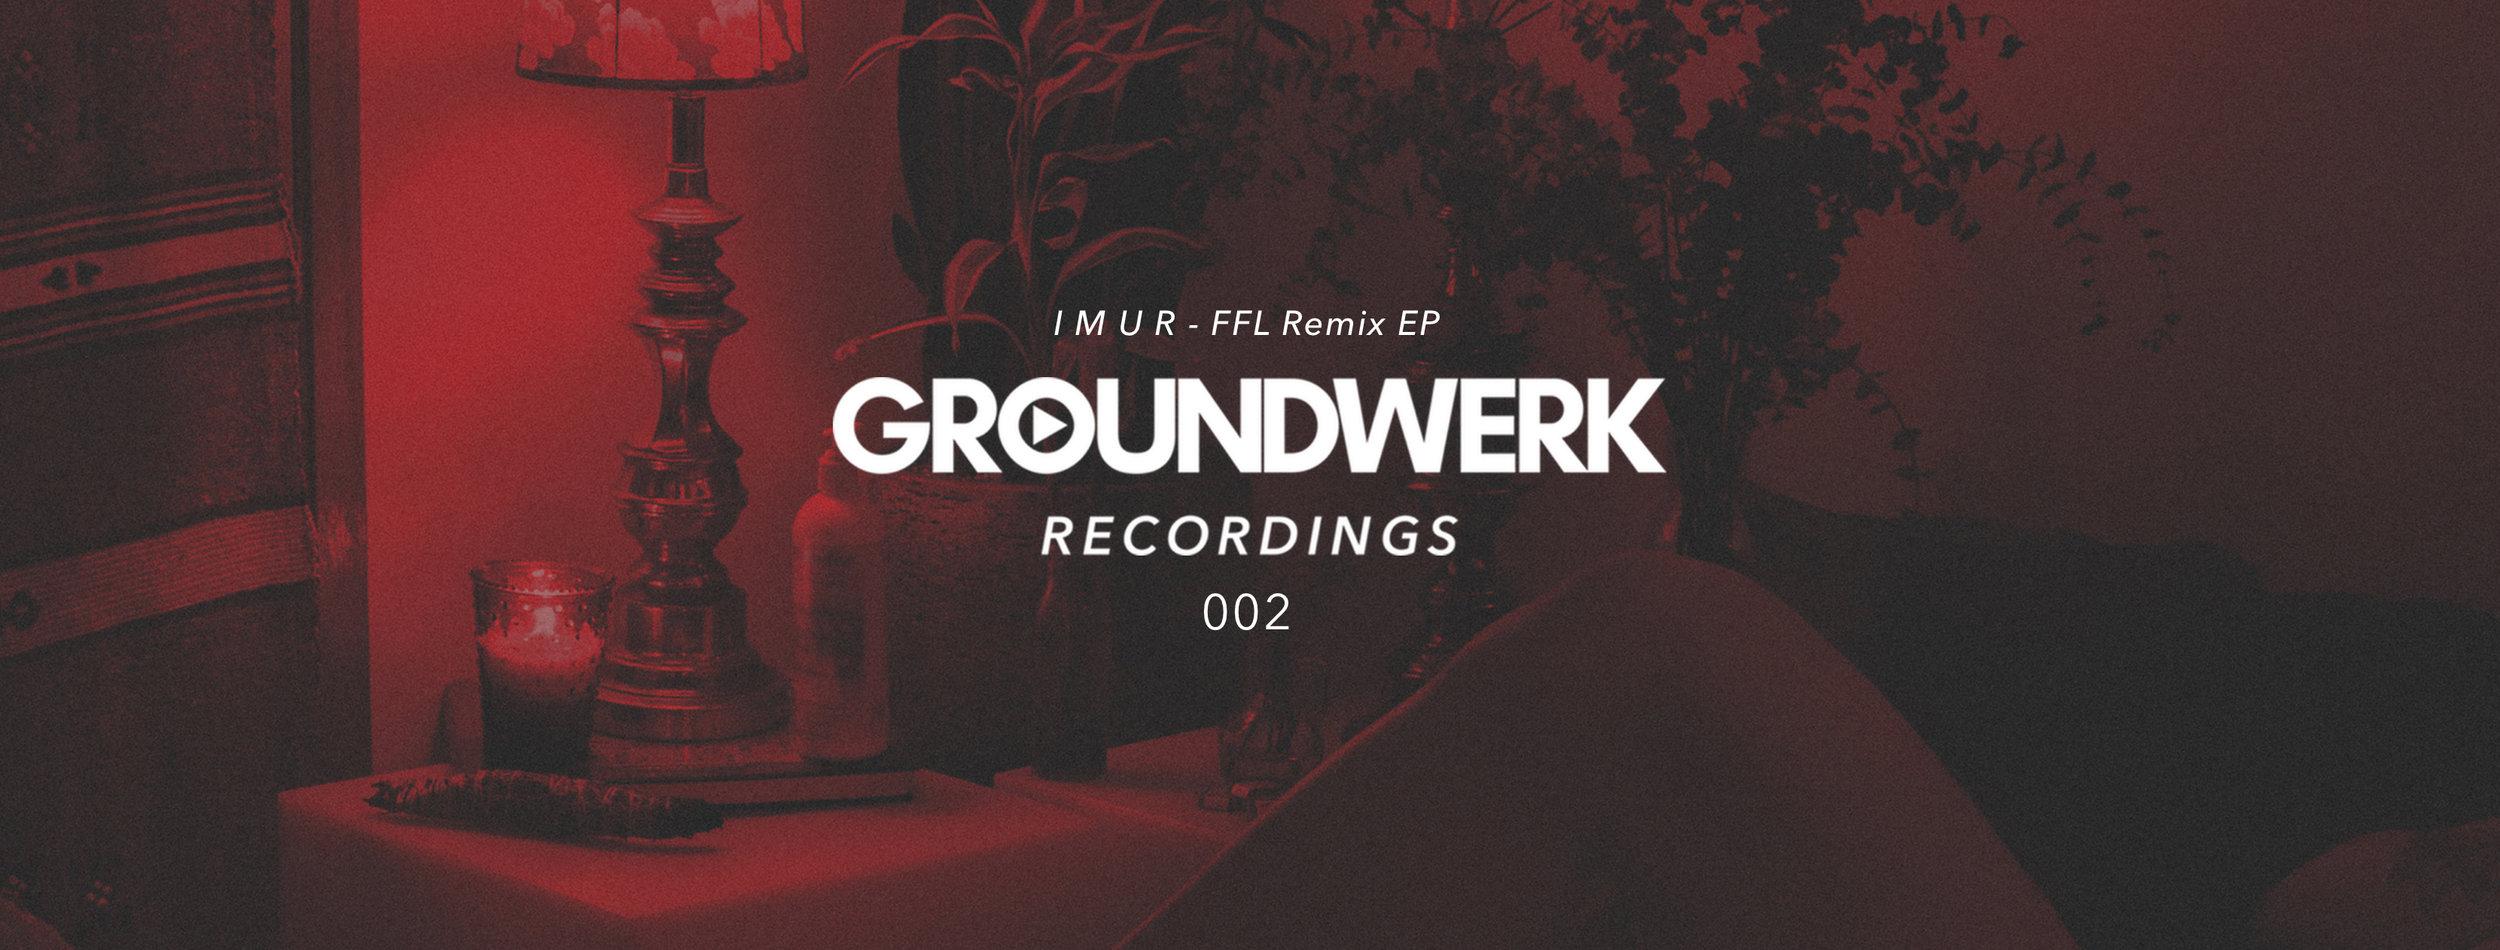 Groundwerk Recordings 002 - I M U R FFL Remix EP